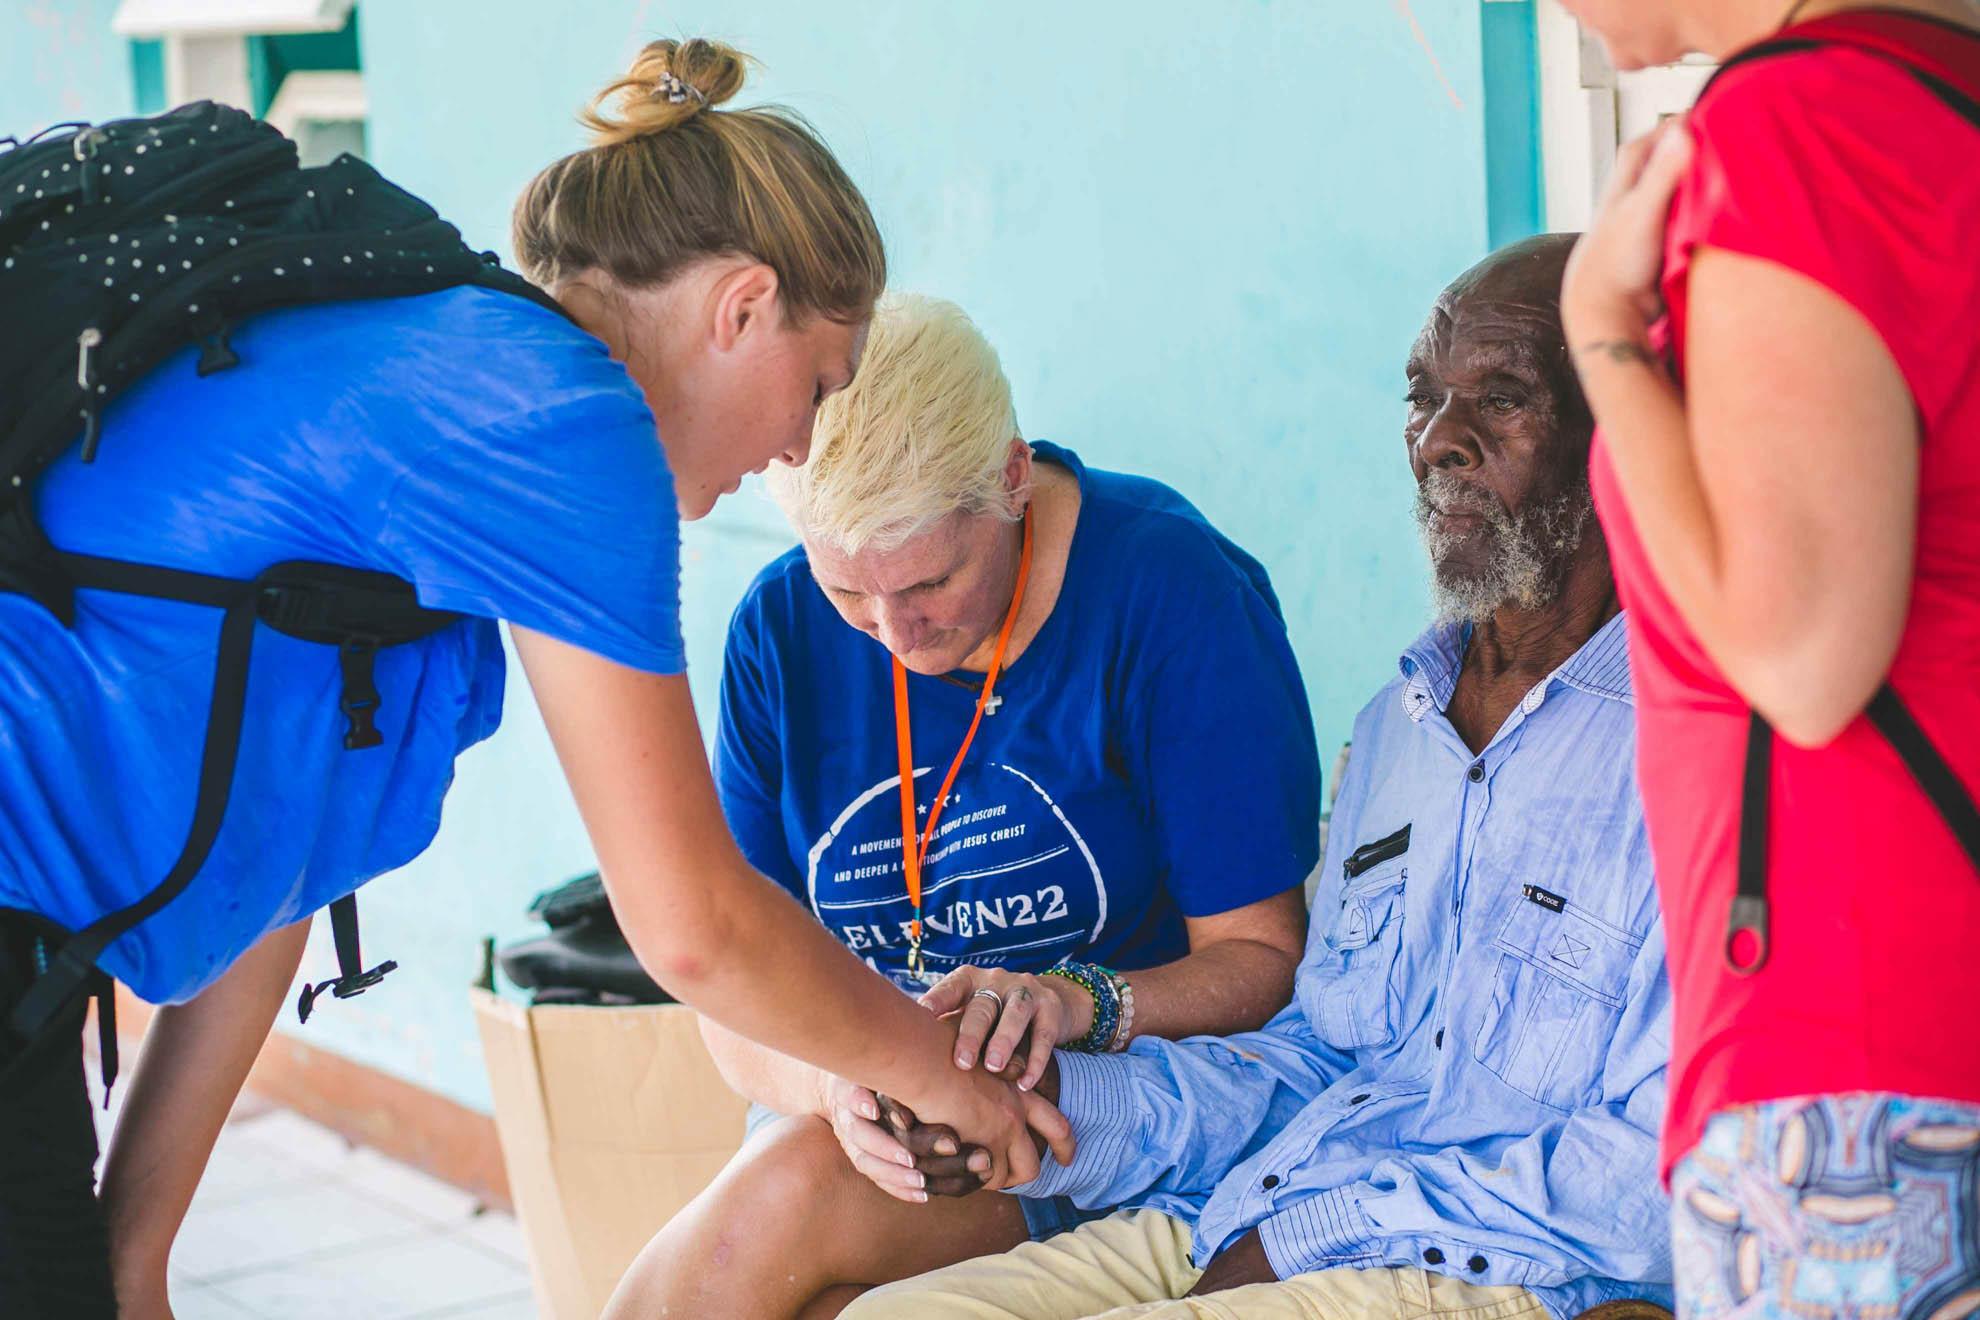 eleven22-missions-jamaica-infirmary-poverty-adam-szarmack-131.jpg